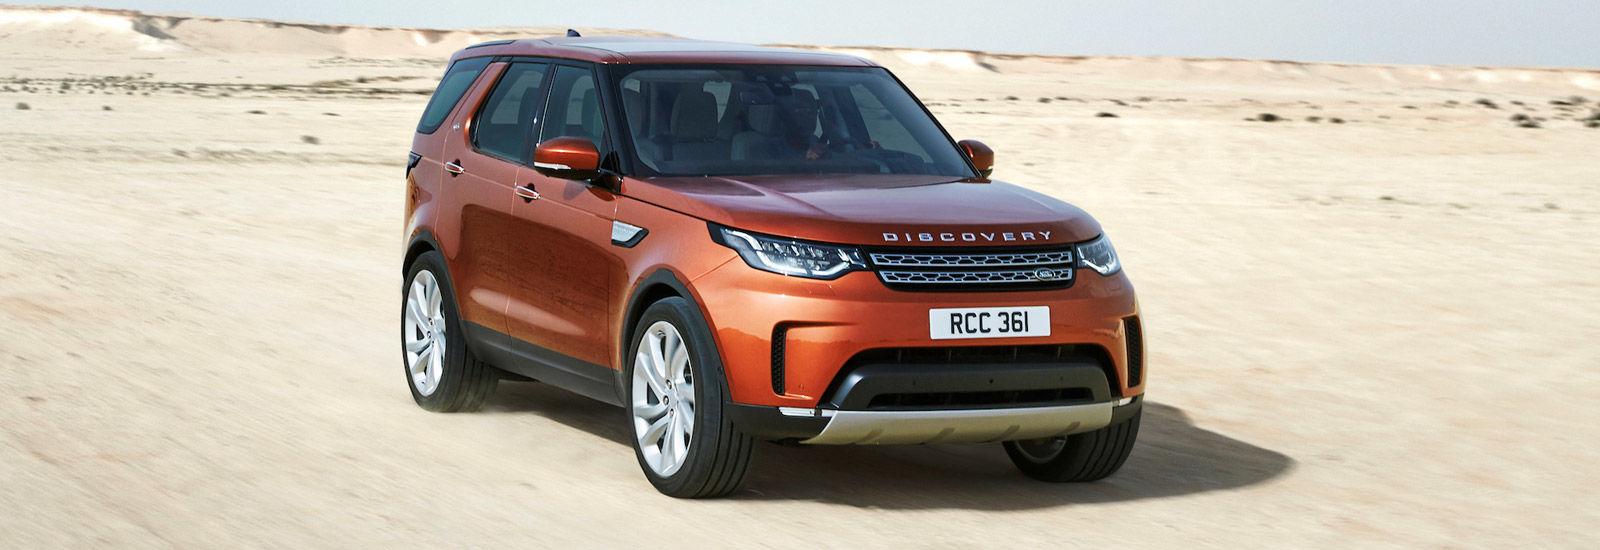 finance offers range rover sport land rover uk autos post. Black Bedroom Furniture Sets. Home Design Ideas